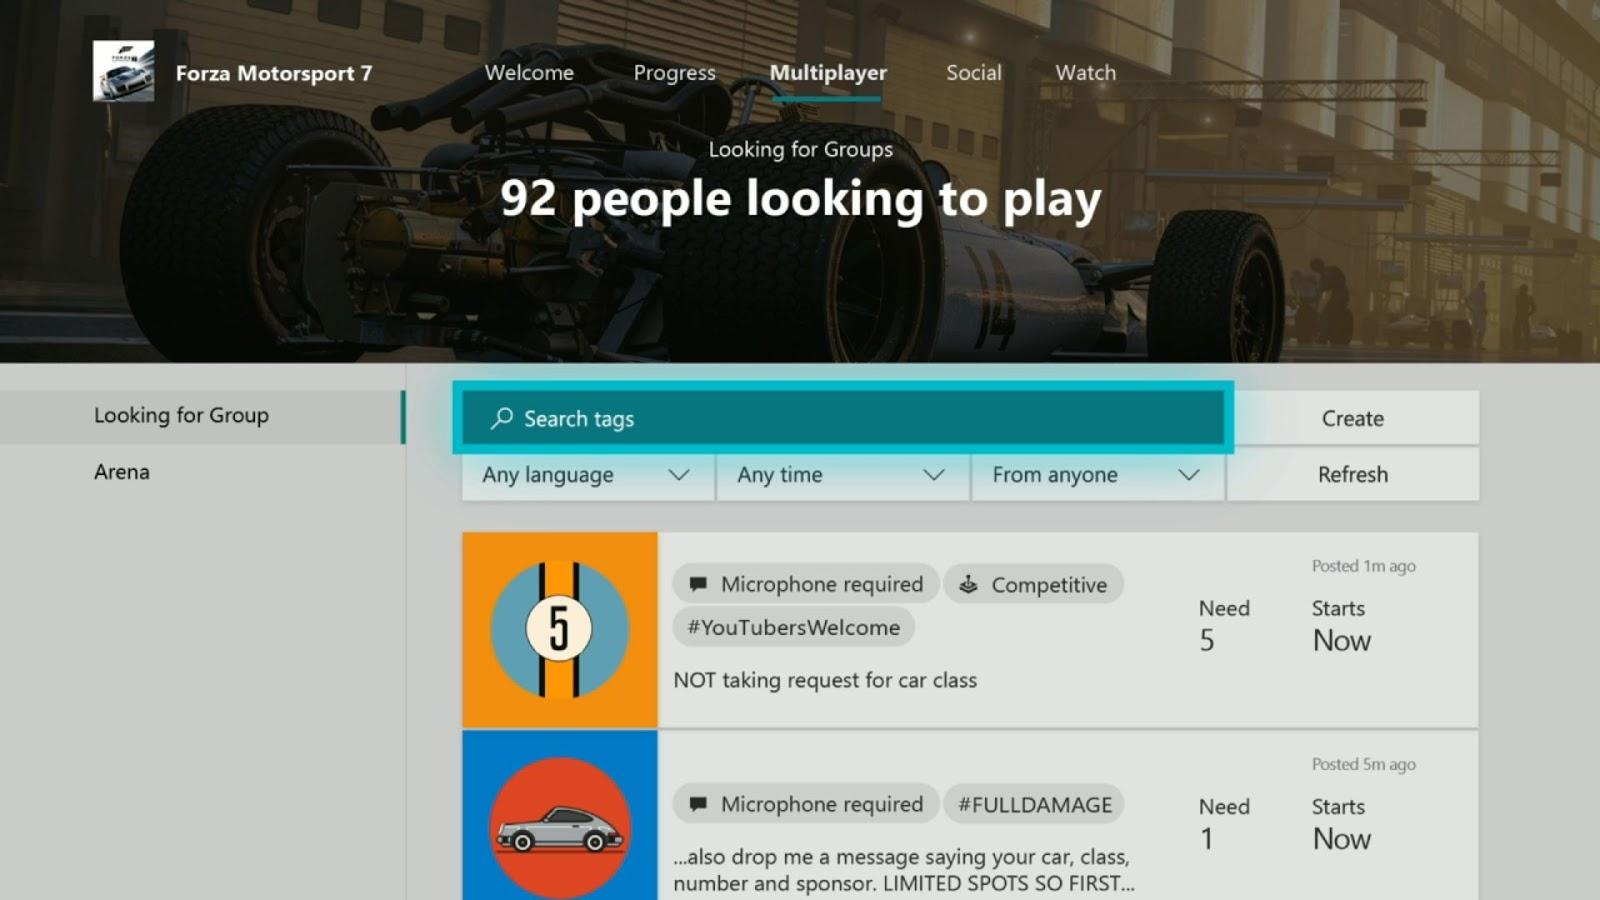 XboxOneUI-5.jpg